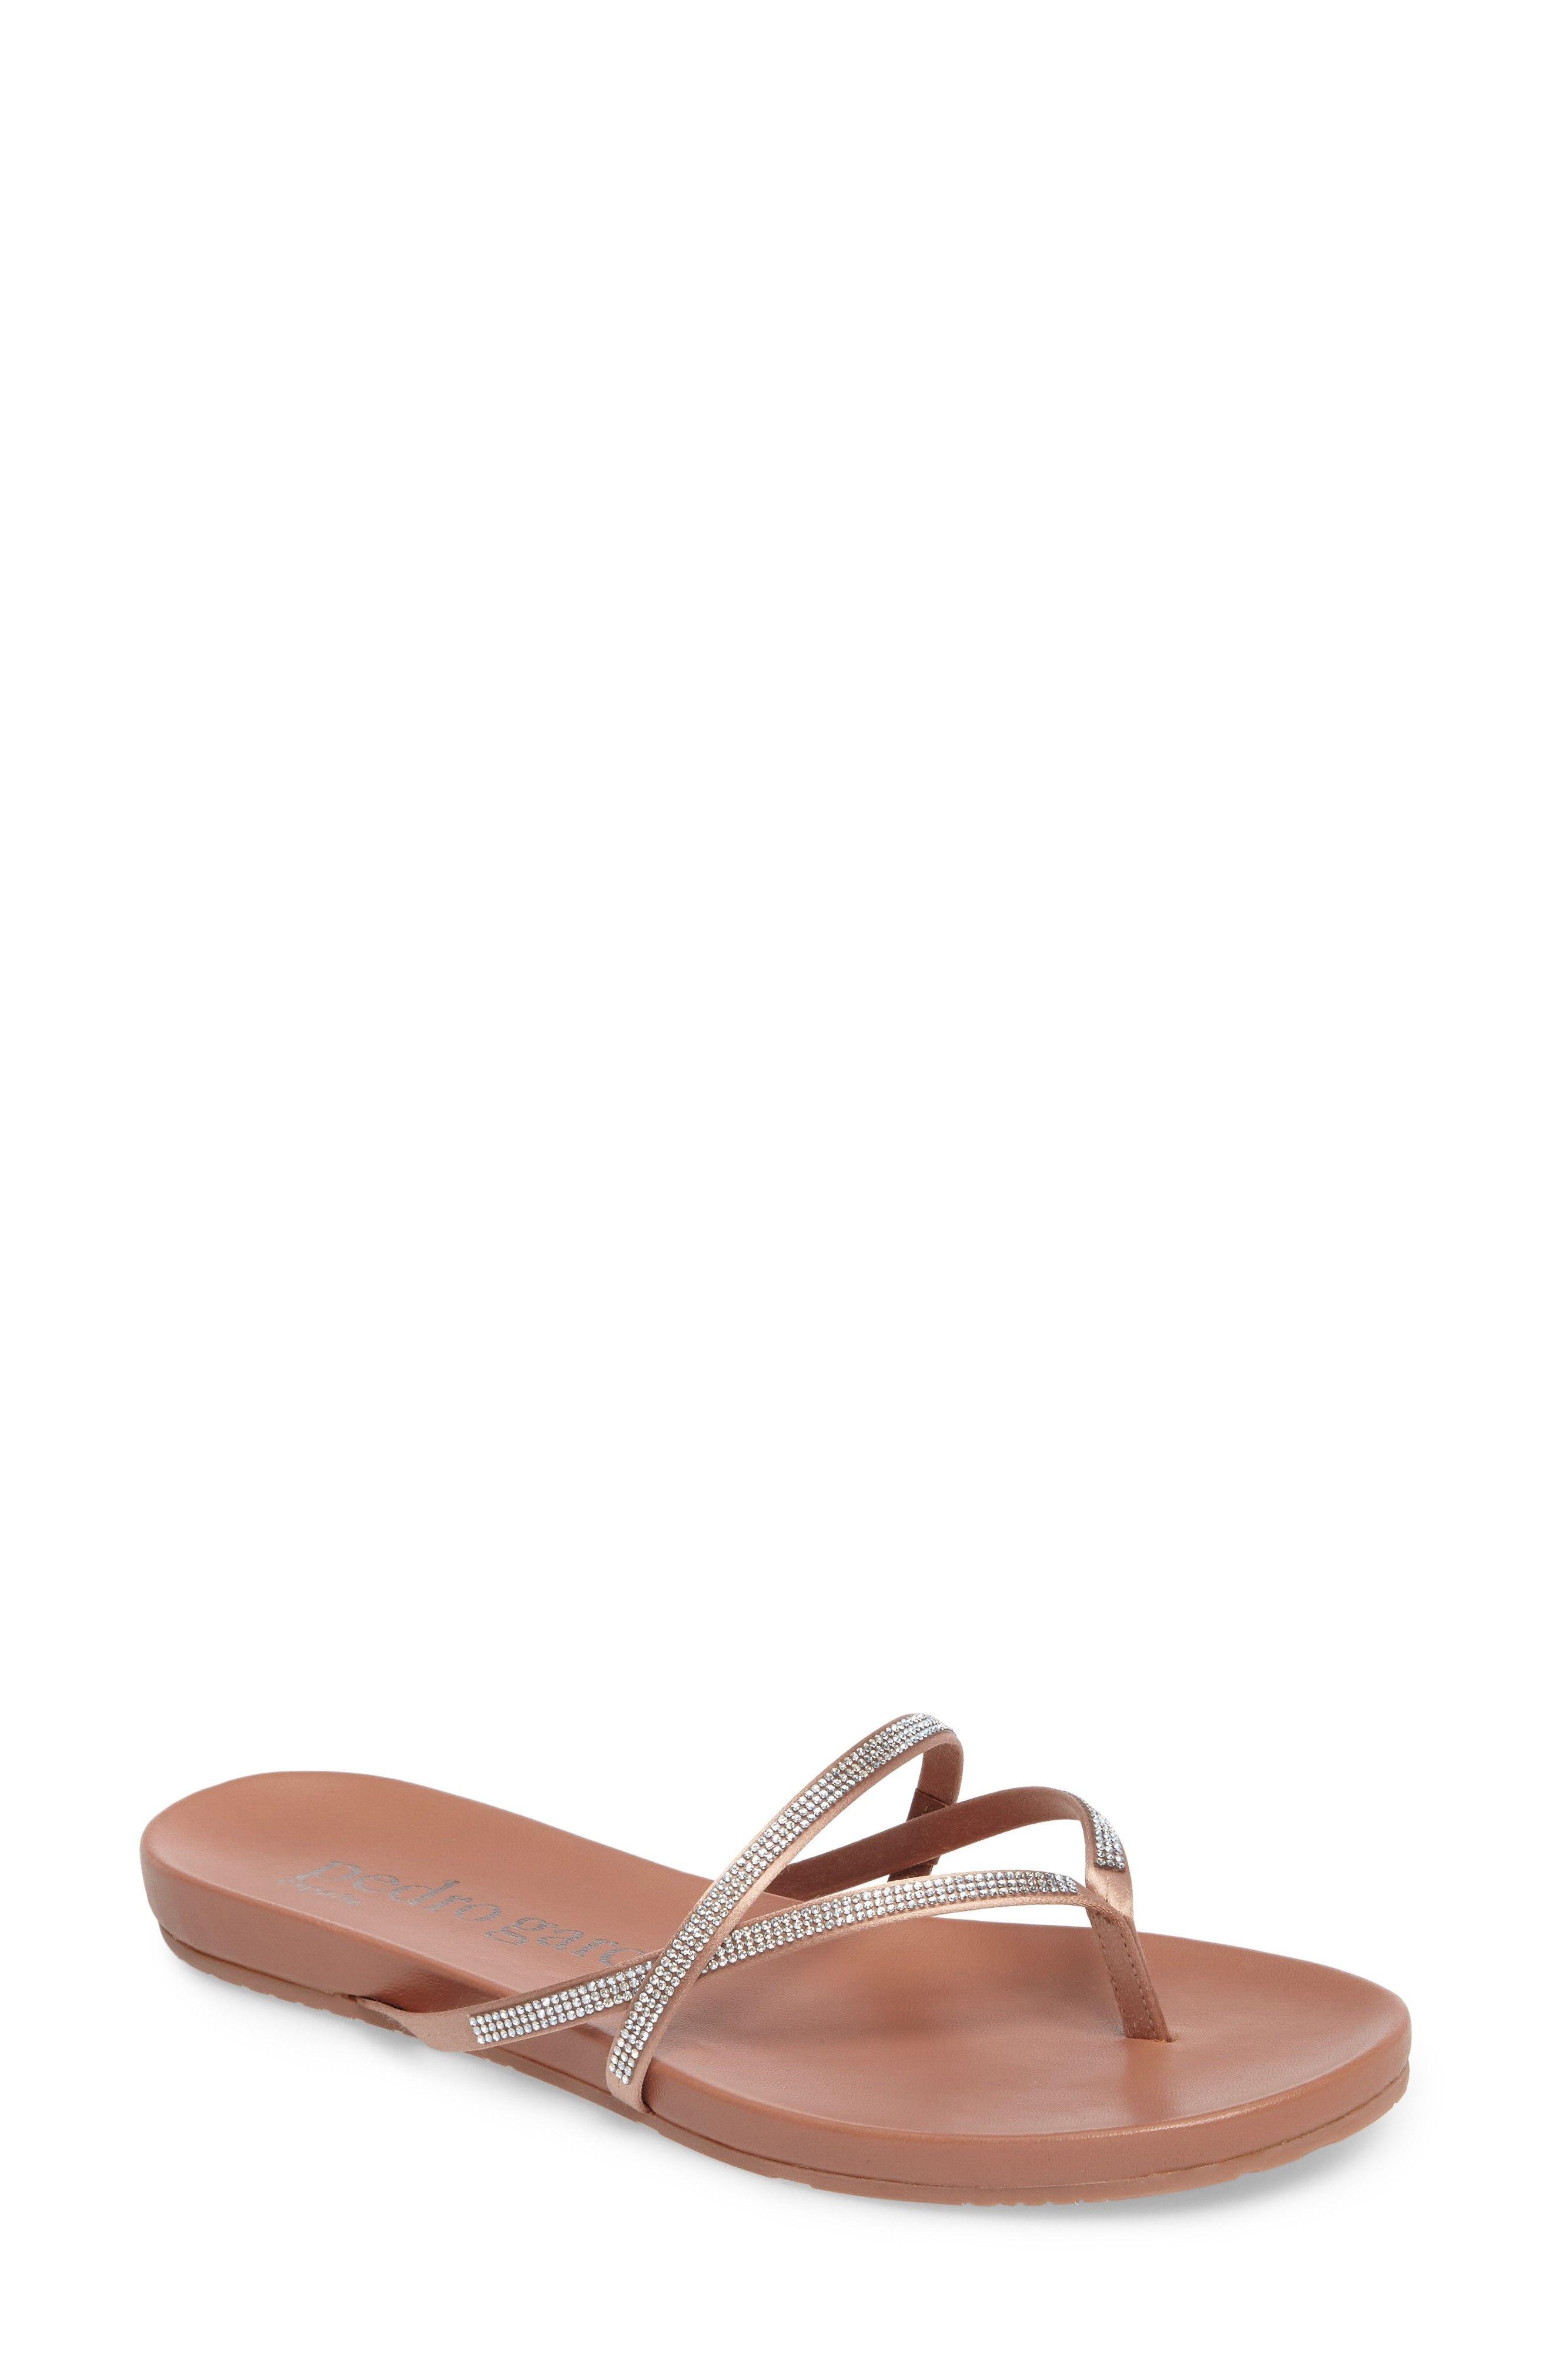 2c916ea5c New PEDRO GARCIA Giulia Crystal Embellished Sandal online. New PEDRO GARCIA  Sandals.   495  SKU ZVUU60158NVKC78687